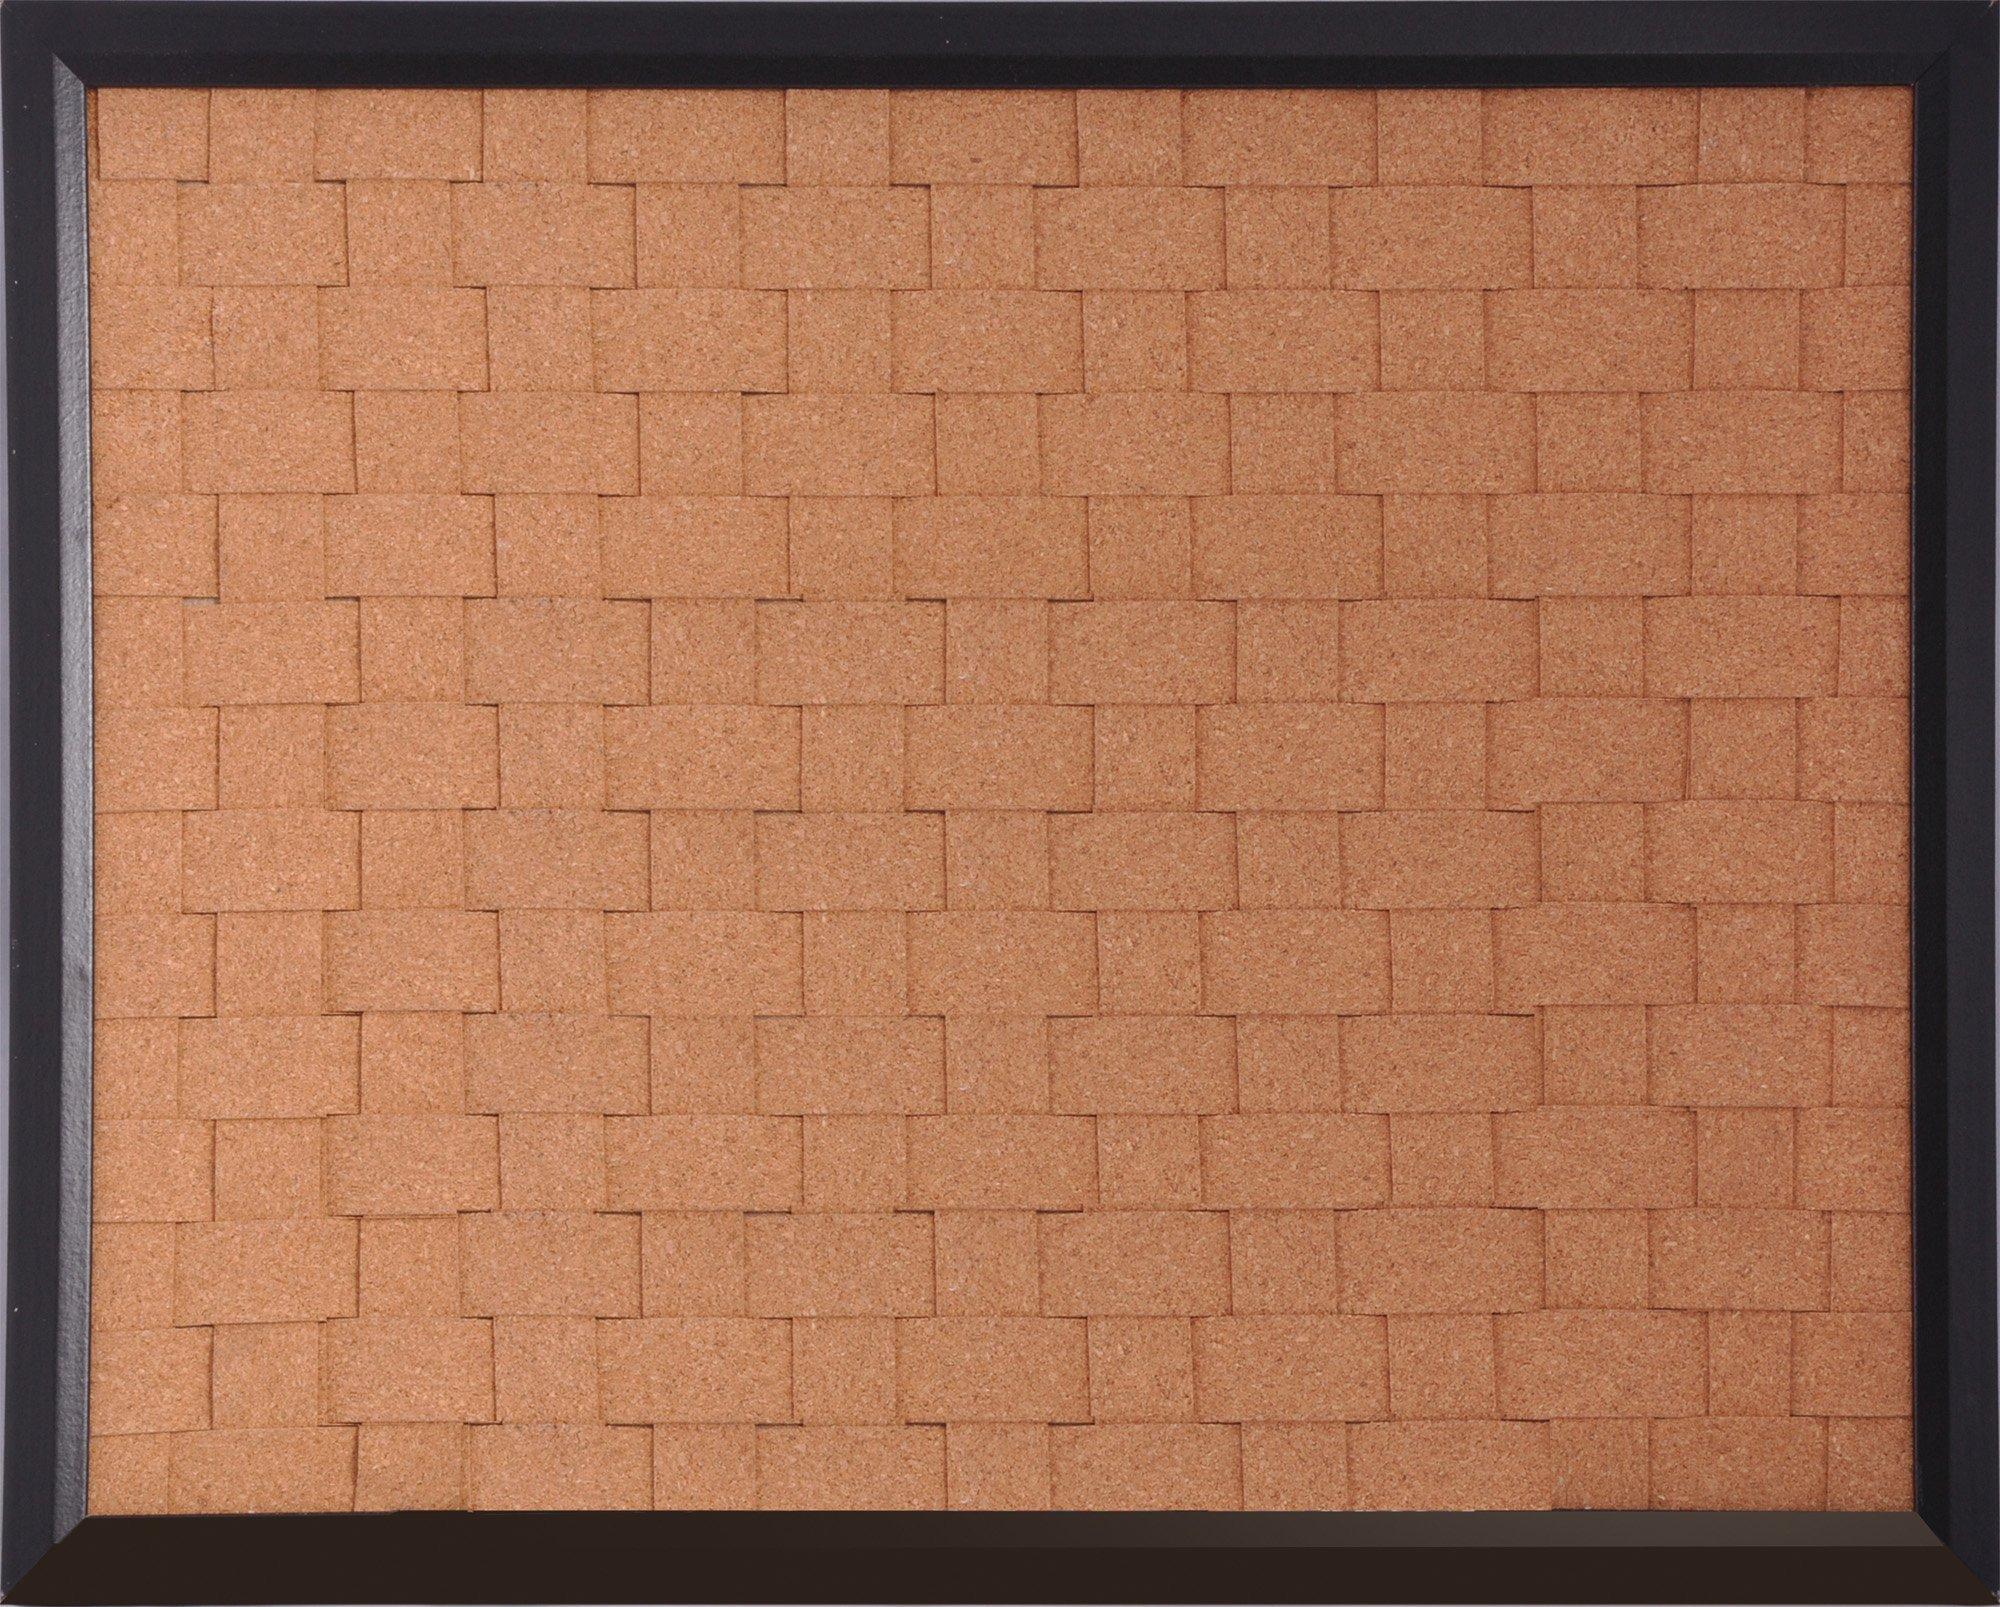 The Board Dudes 16'' x 20'' Black Framed Woven Cork Board (CYL42)